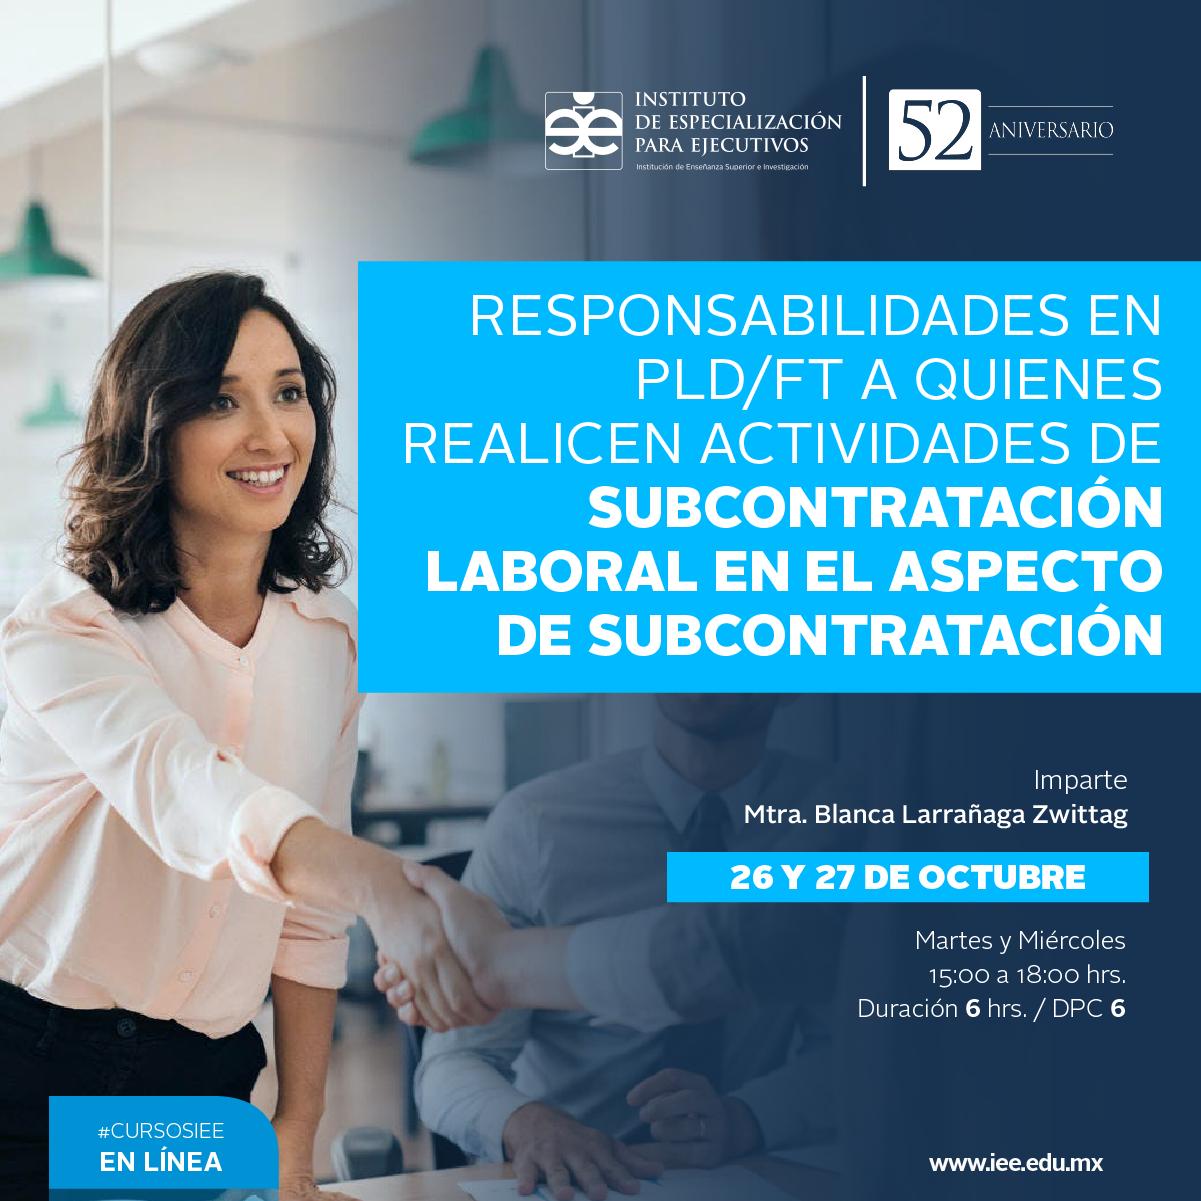 Curso en Línea en Responsabilidades en PLD/FT a Quienes Realicen Actividades de Subcontratación Laboral en el Aspecto de Subcontratación